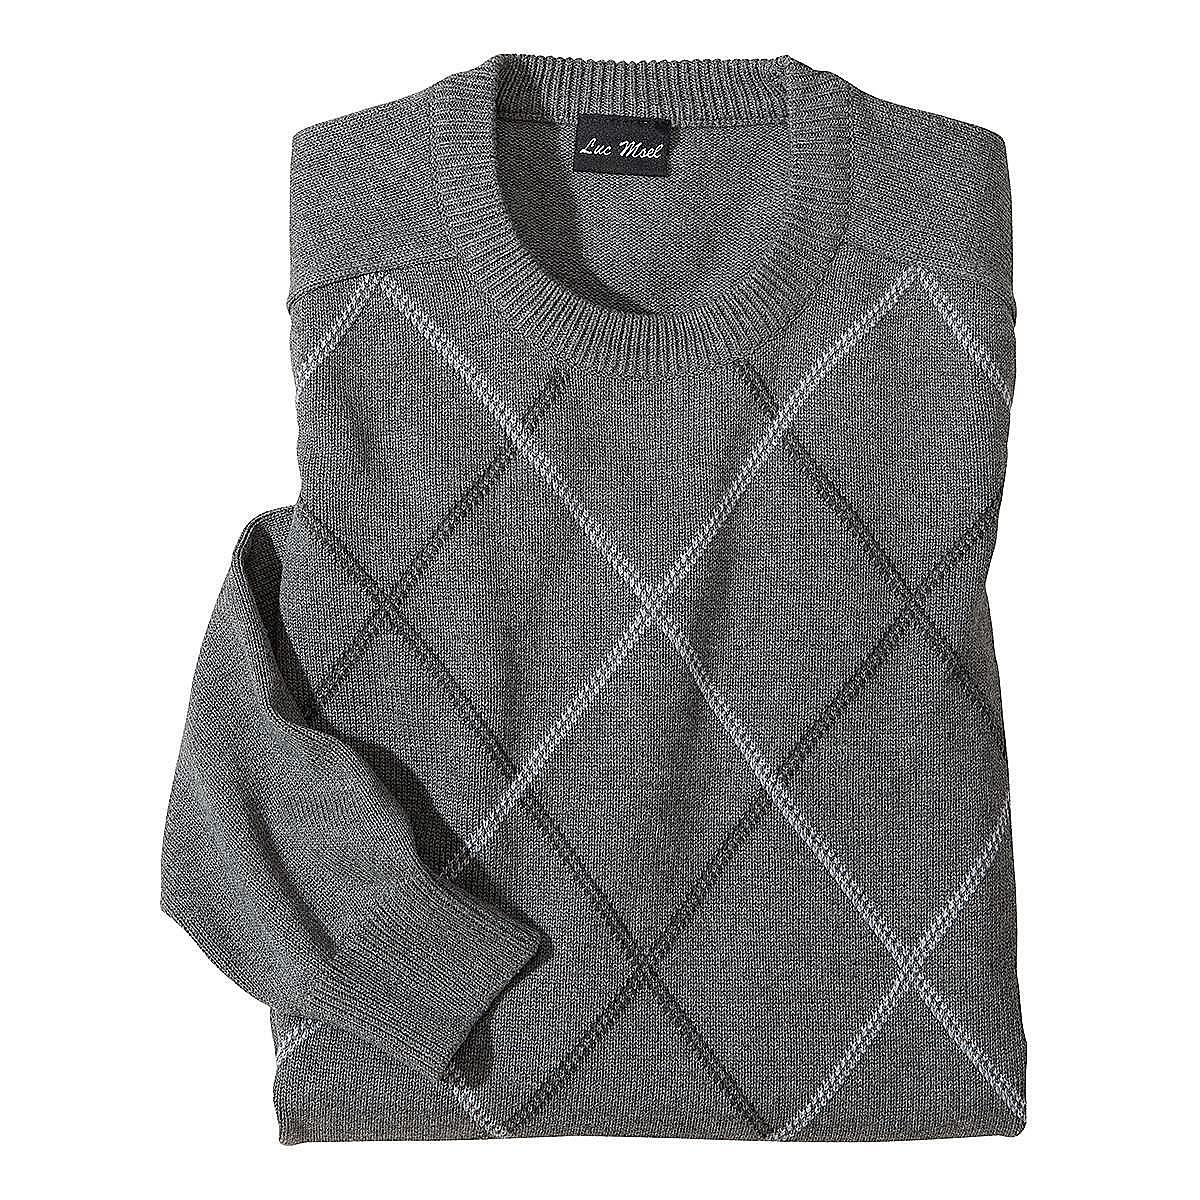 baumwoll pullover farbe grau gr enspezialist m nnermode. Black Bedroom Furniture Sets. Home Design Ideas